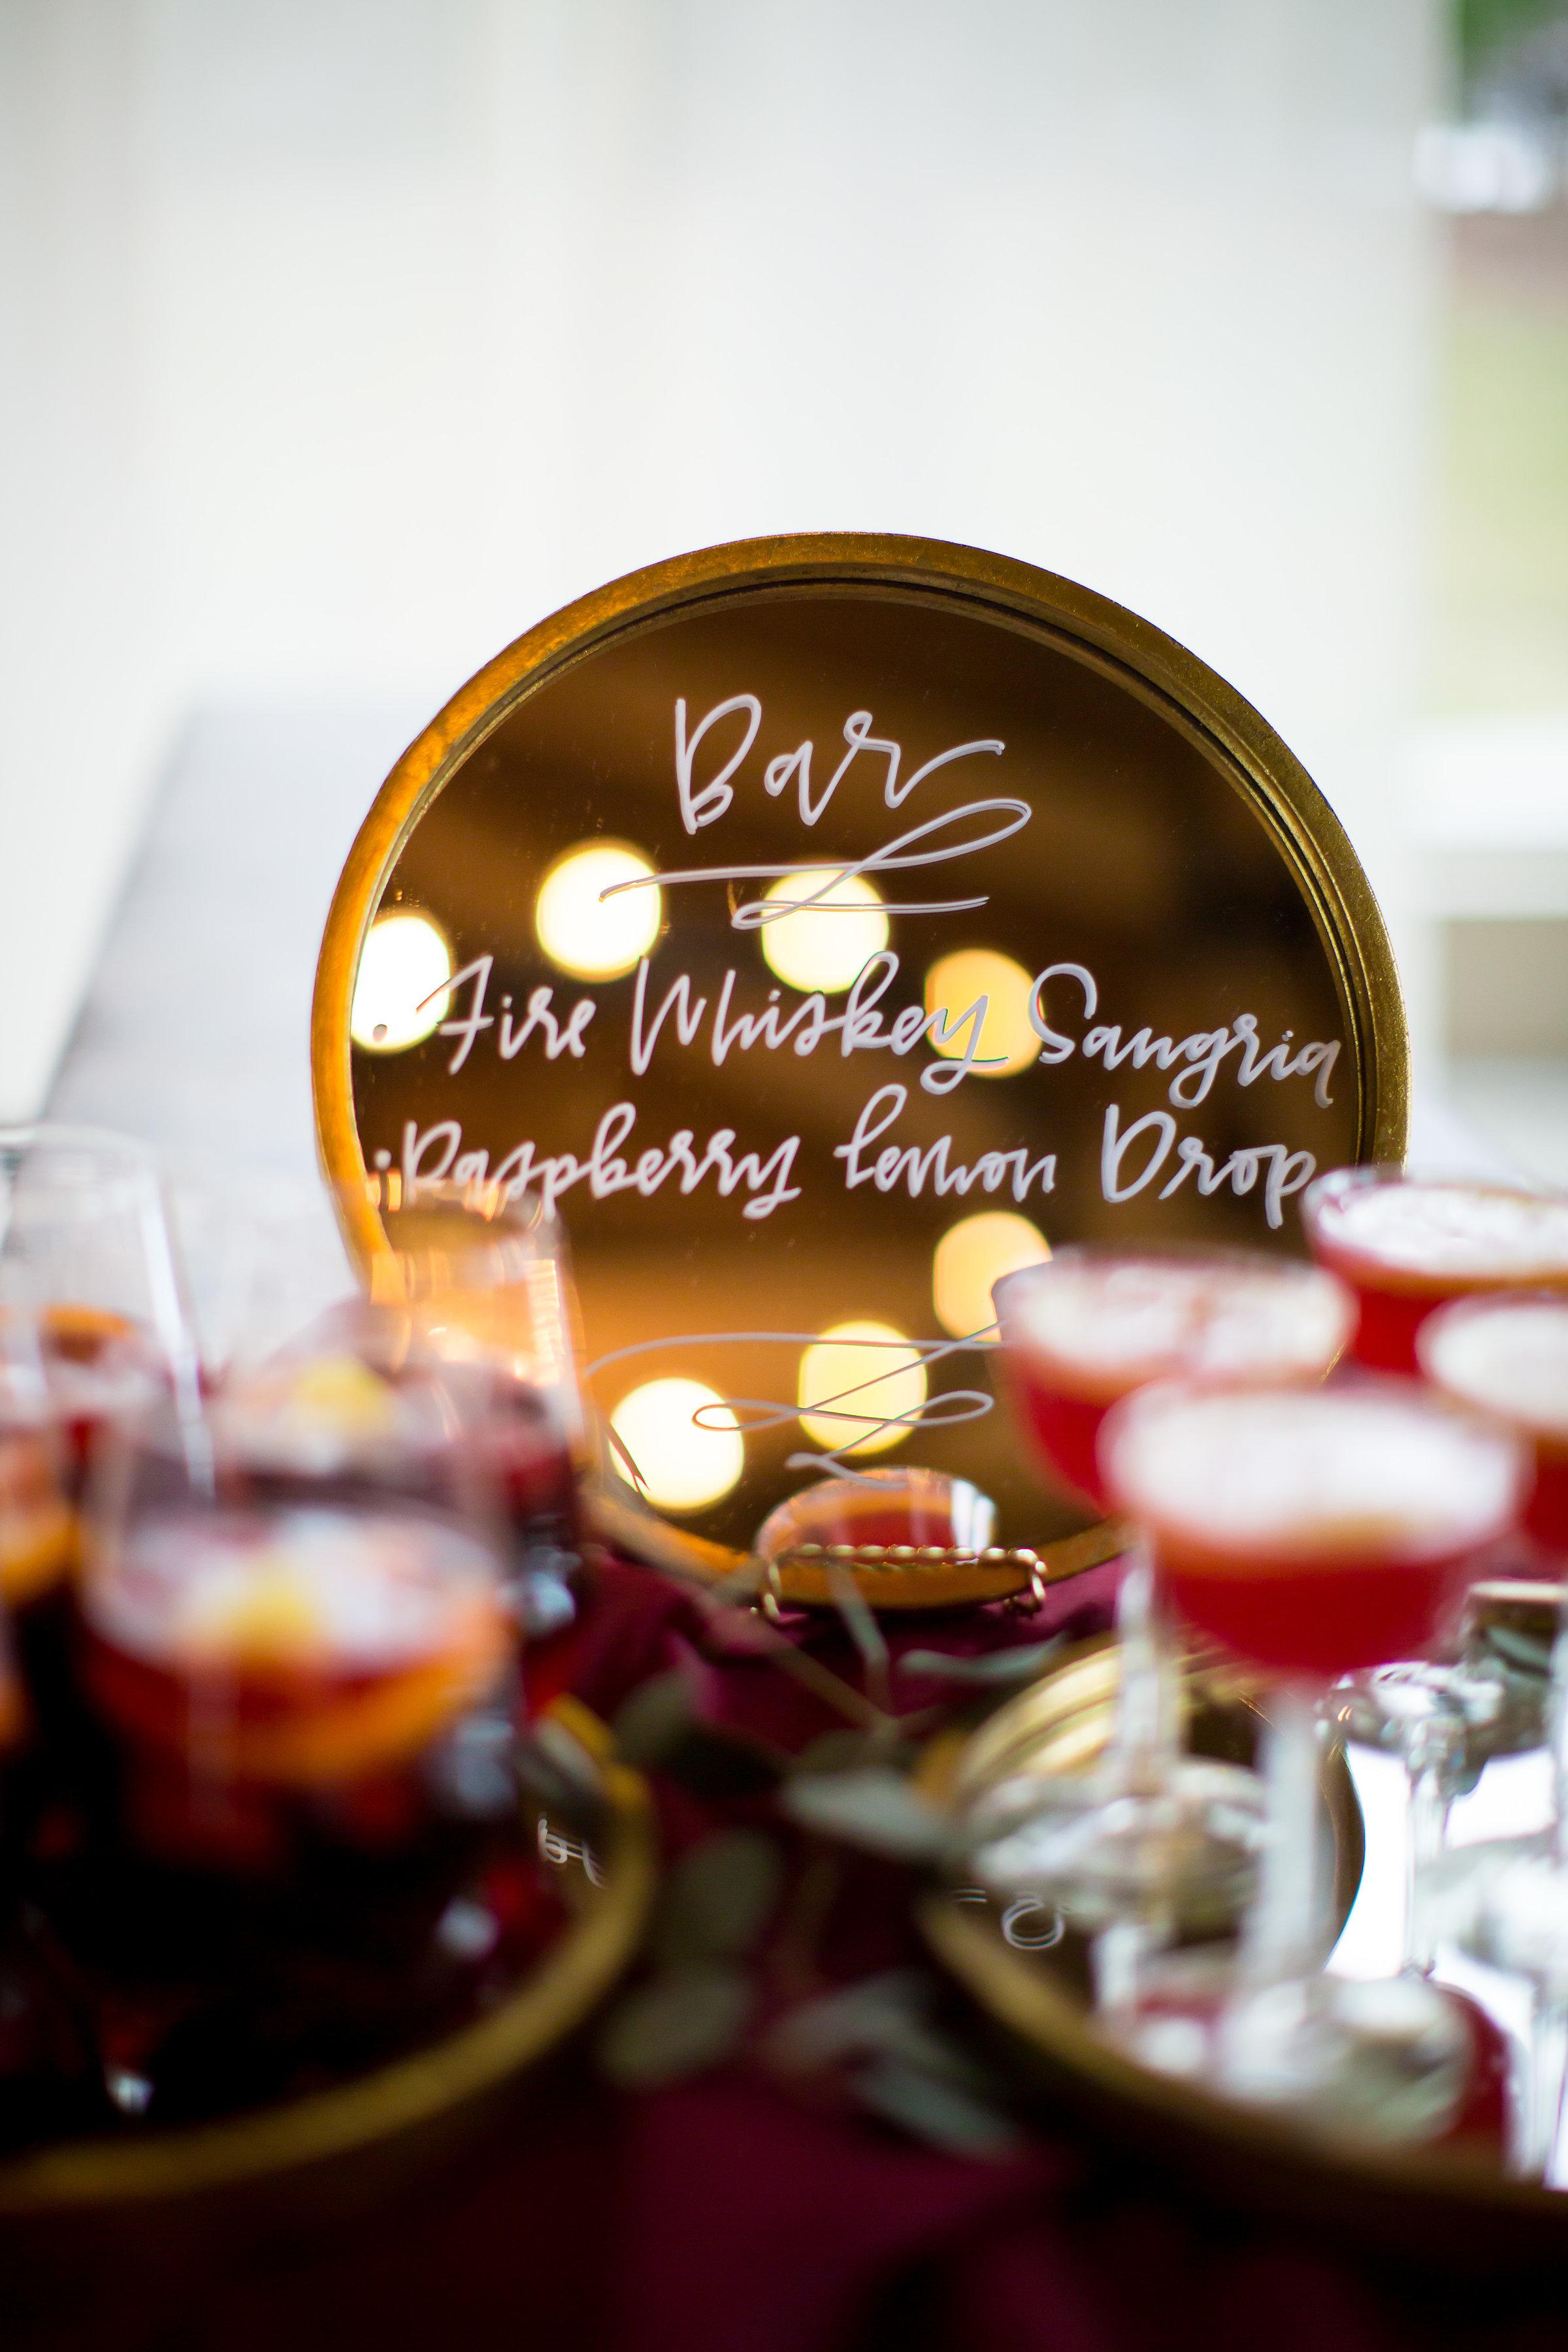 Bar-Pear-Tree-Estate-Romantic-Wedding-Styled-Shoot-Mager-Image-Photography-9818.jpg